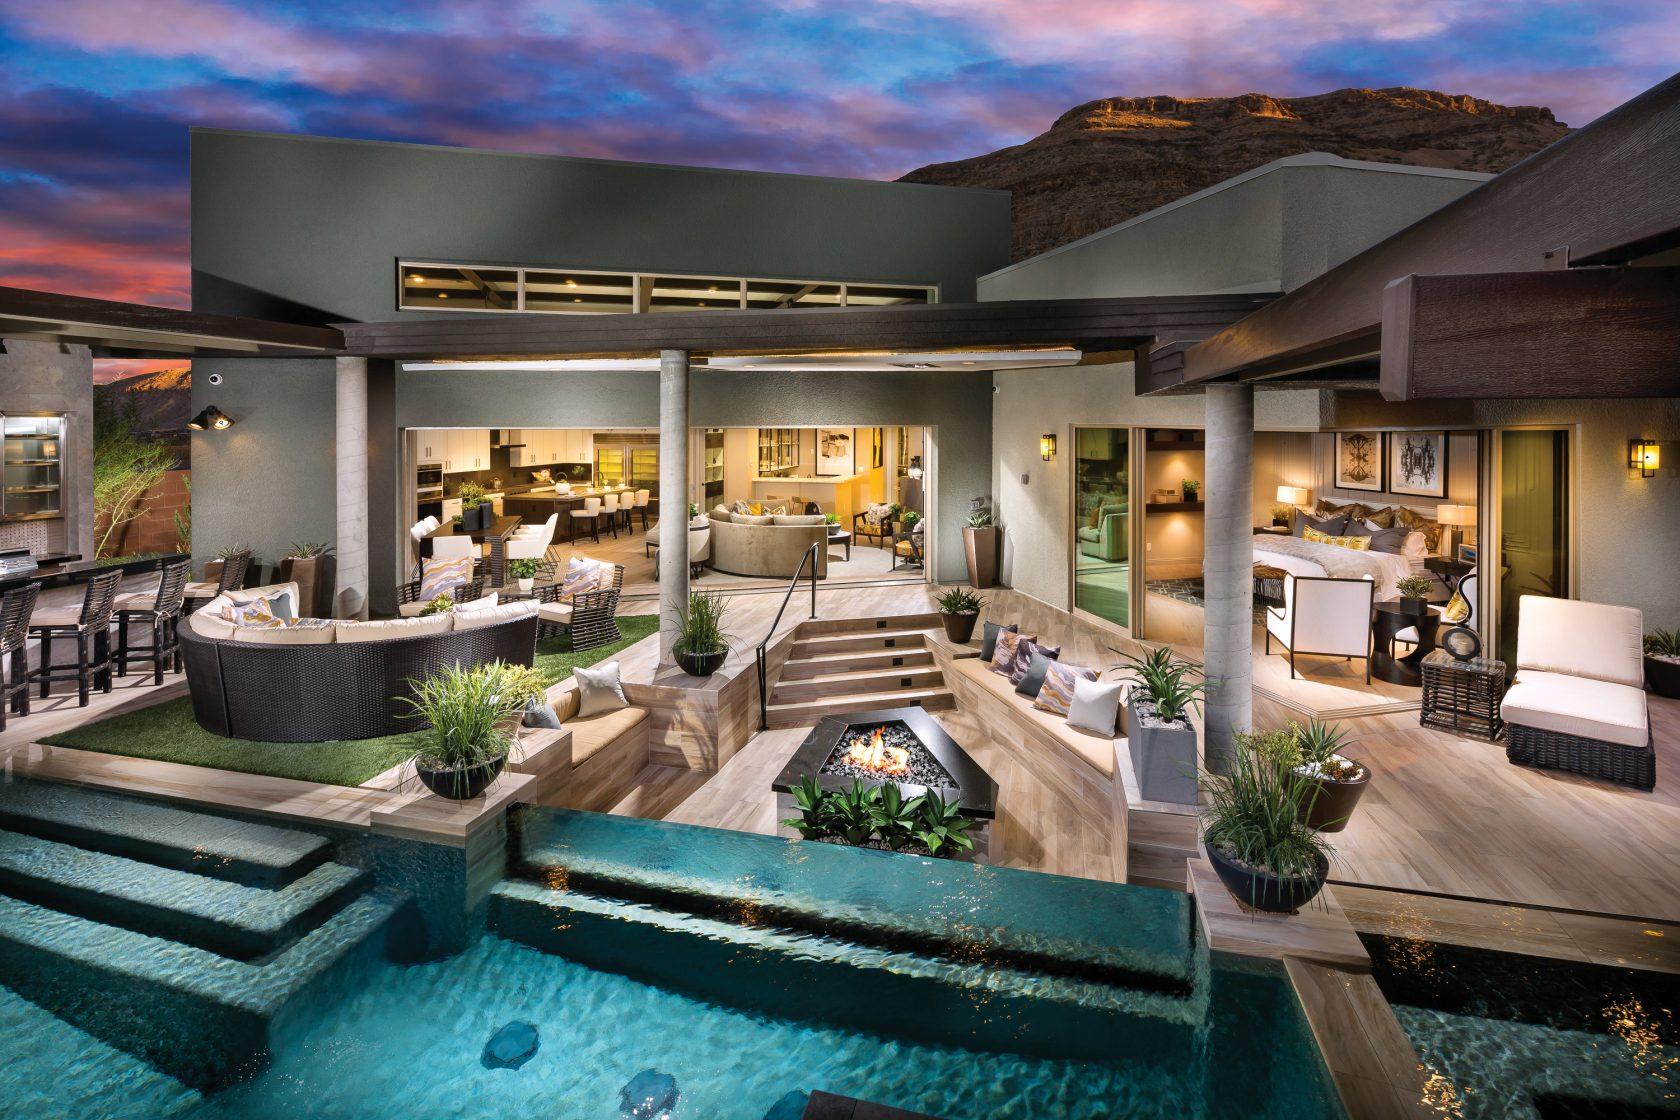 Patio Ideas: Outdoor Fireplaces Meet Hygge Home Decor ... on Backyard Patio  id=26695